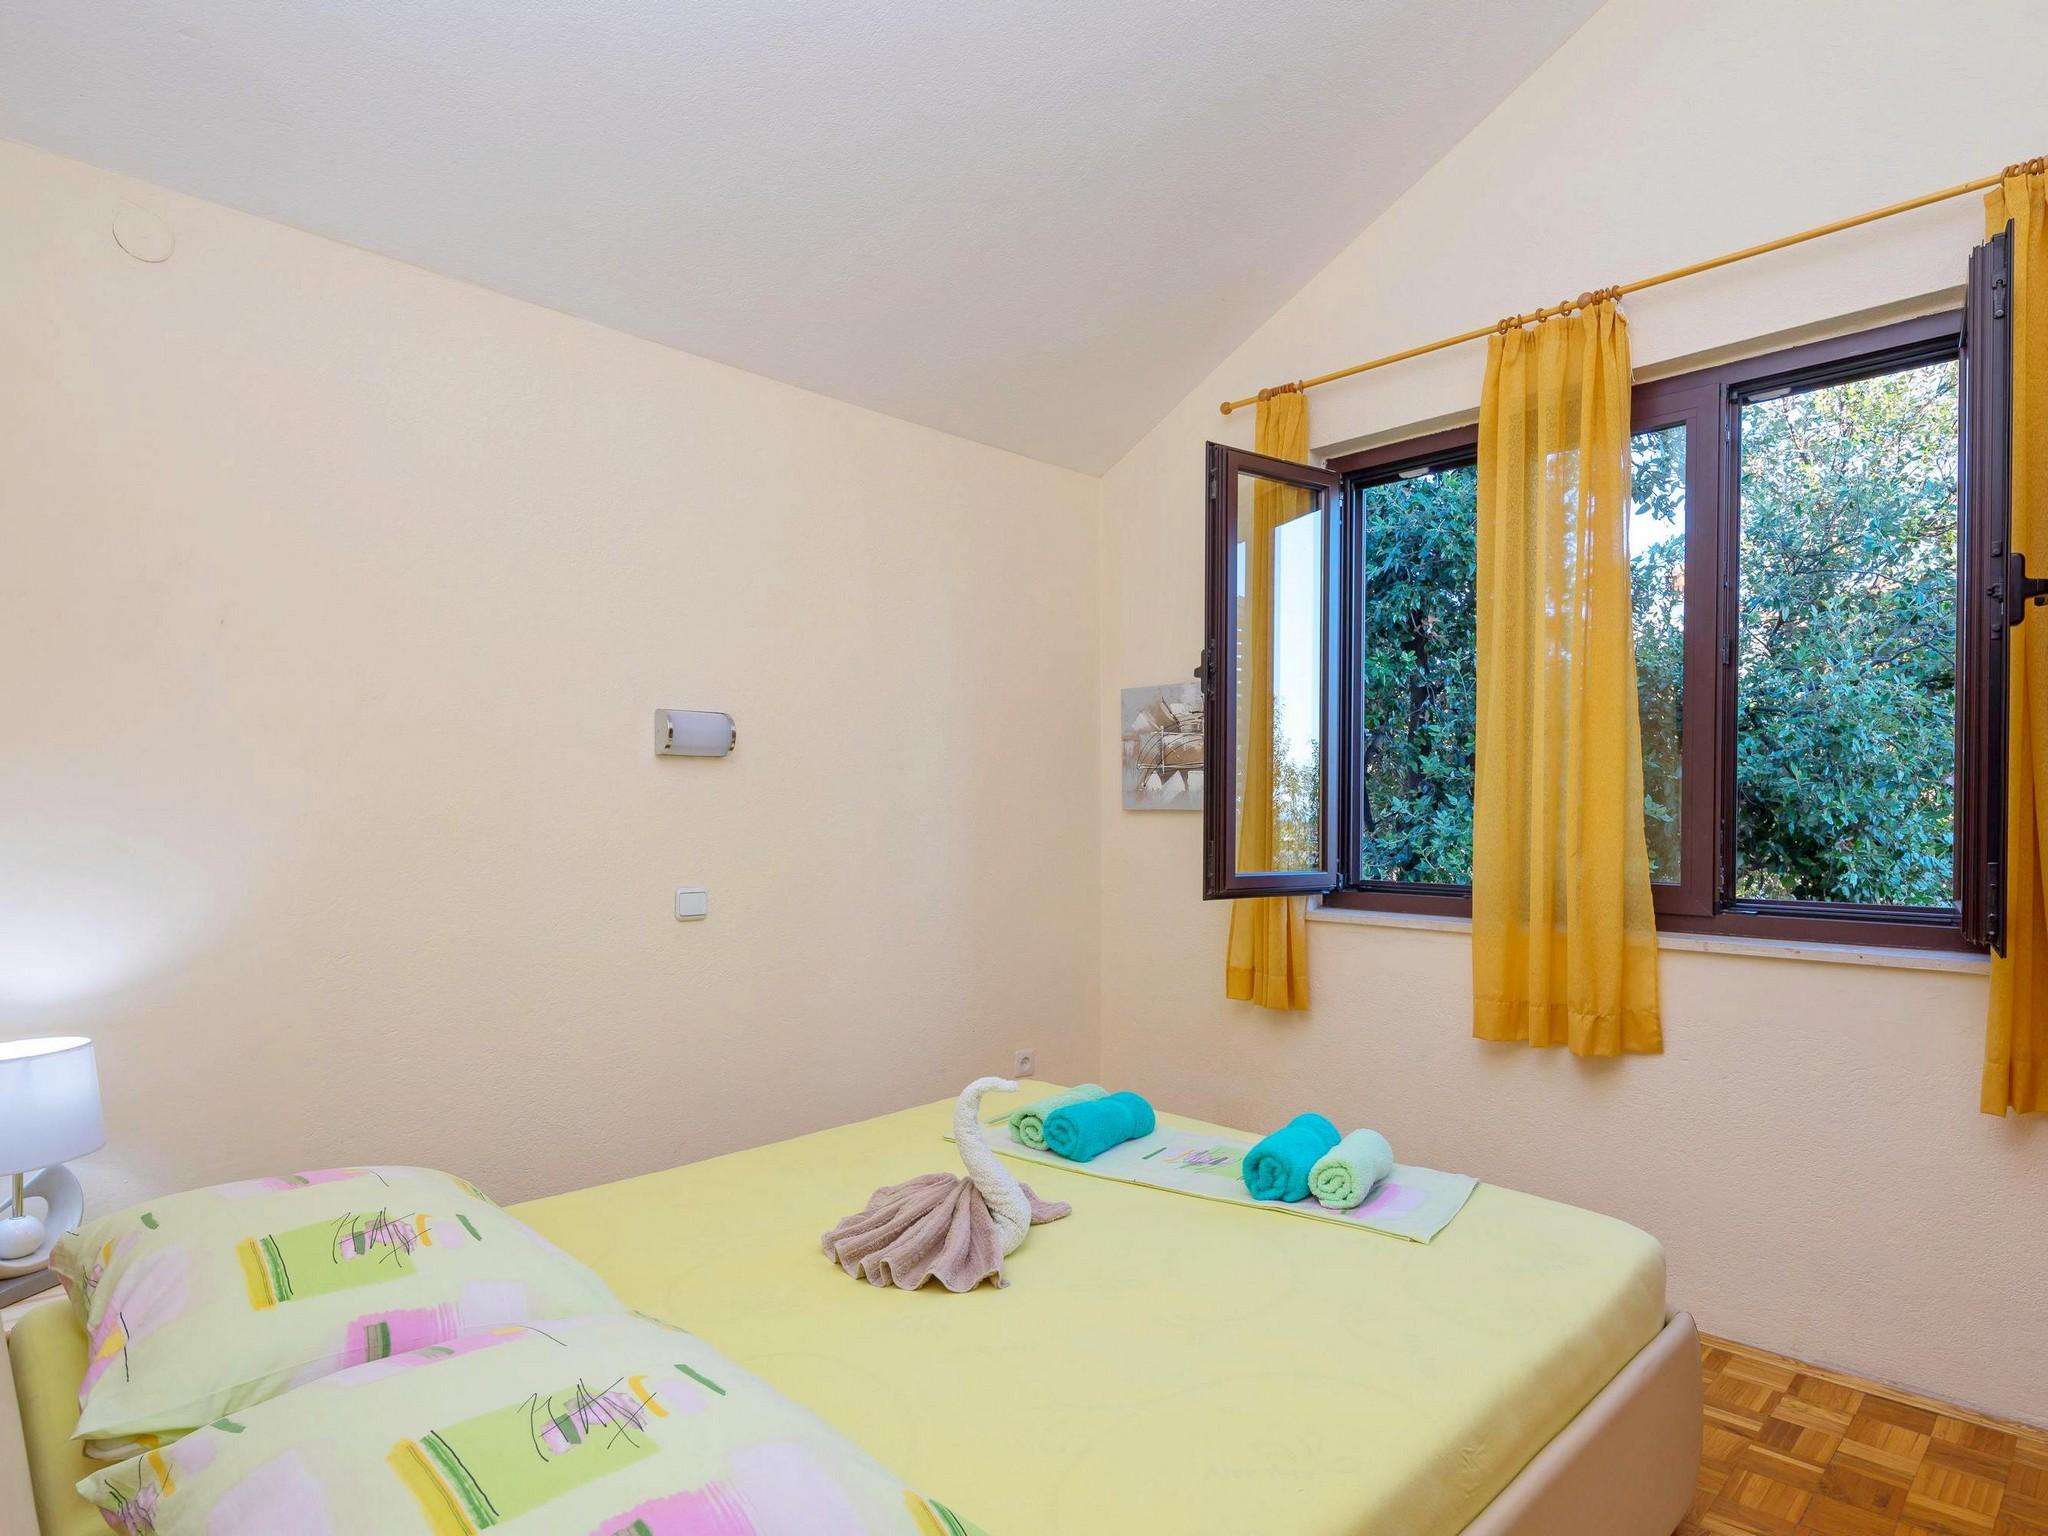 Ferienhaus Tanja, Kua K6+2 (940510), Kanica, , Dalmatien, Kroatien, Bild 28